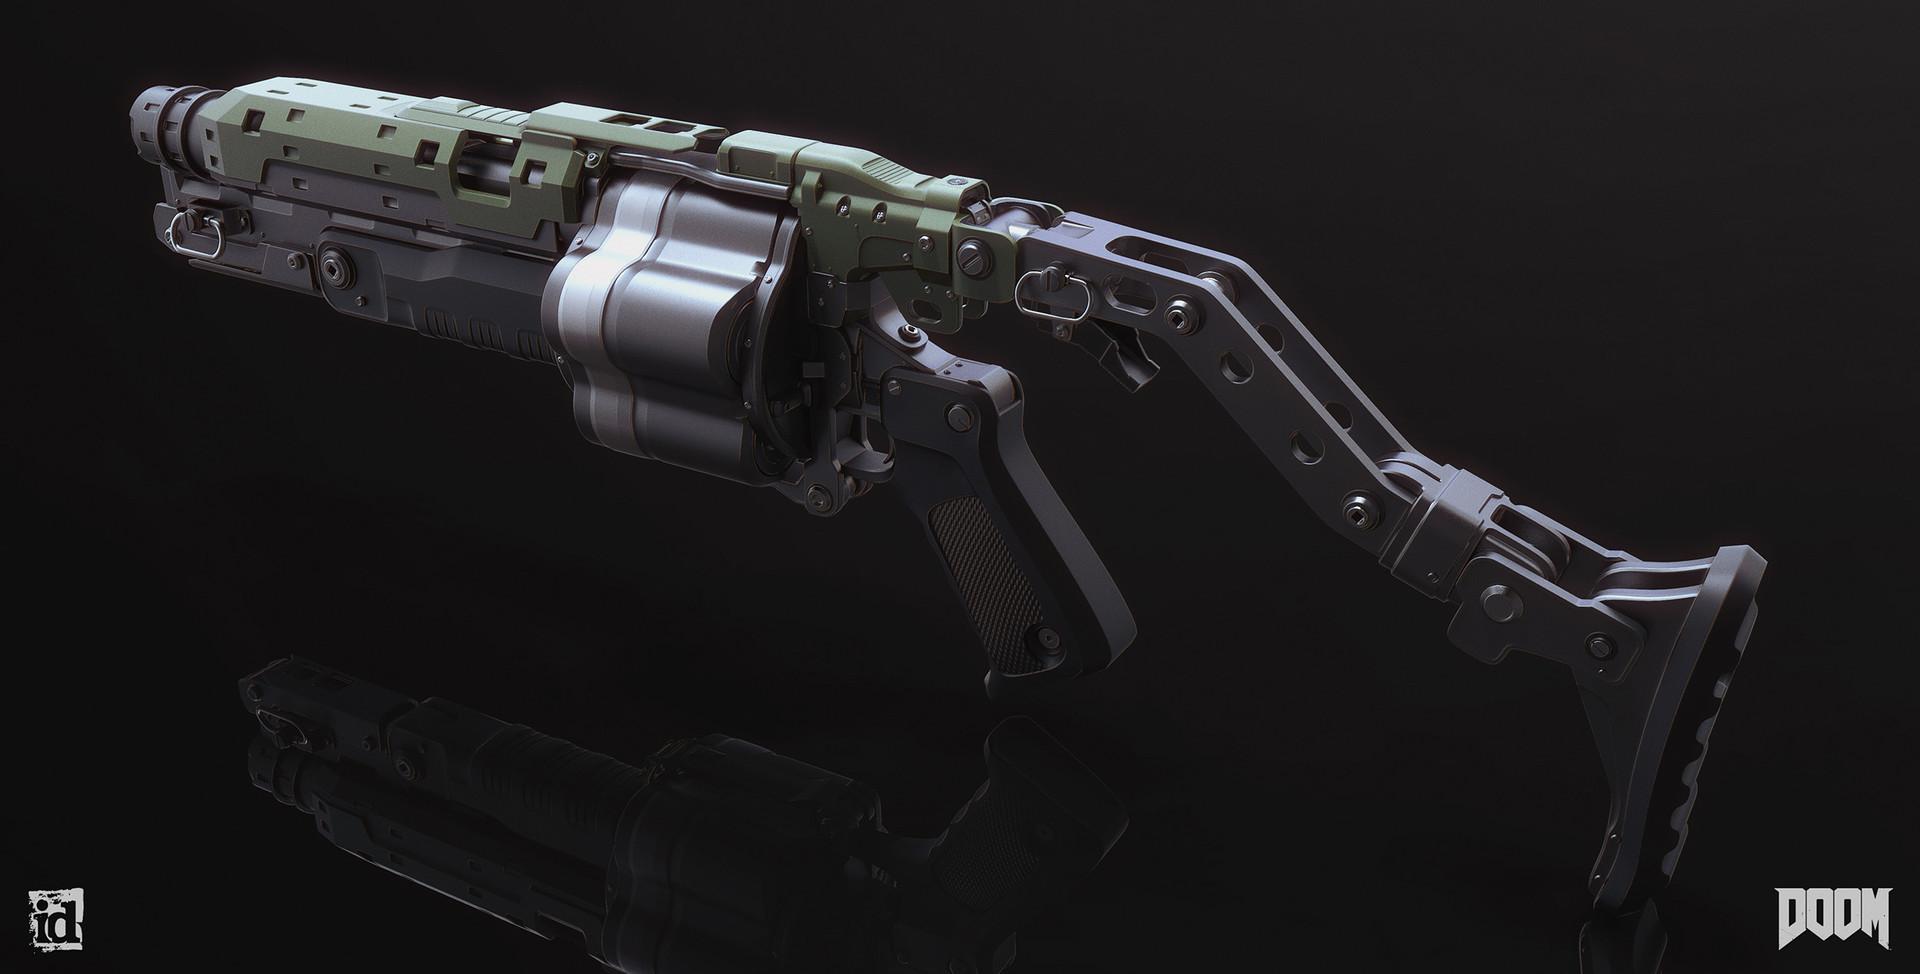 Mark van haitsma grenade launcher back perspective sm